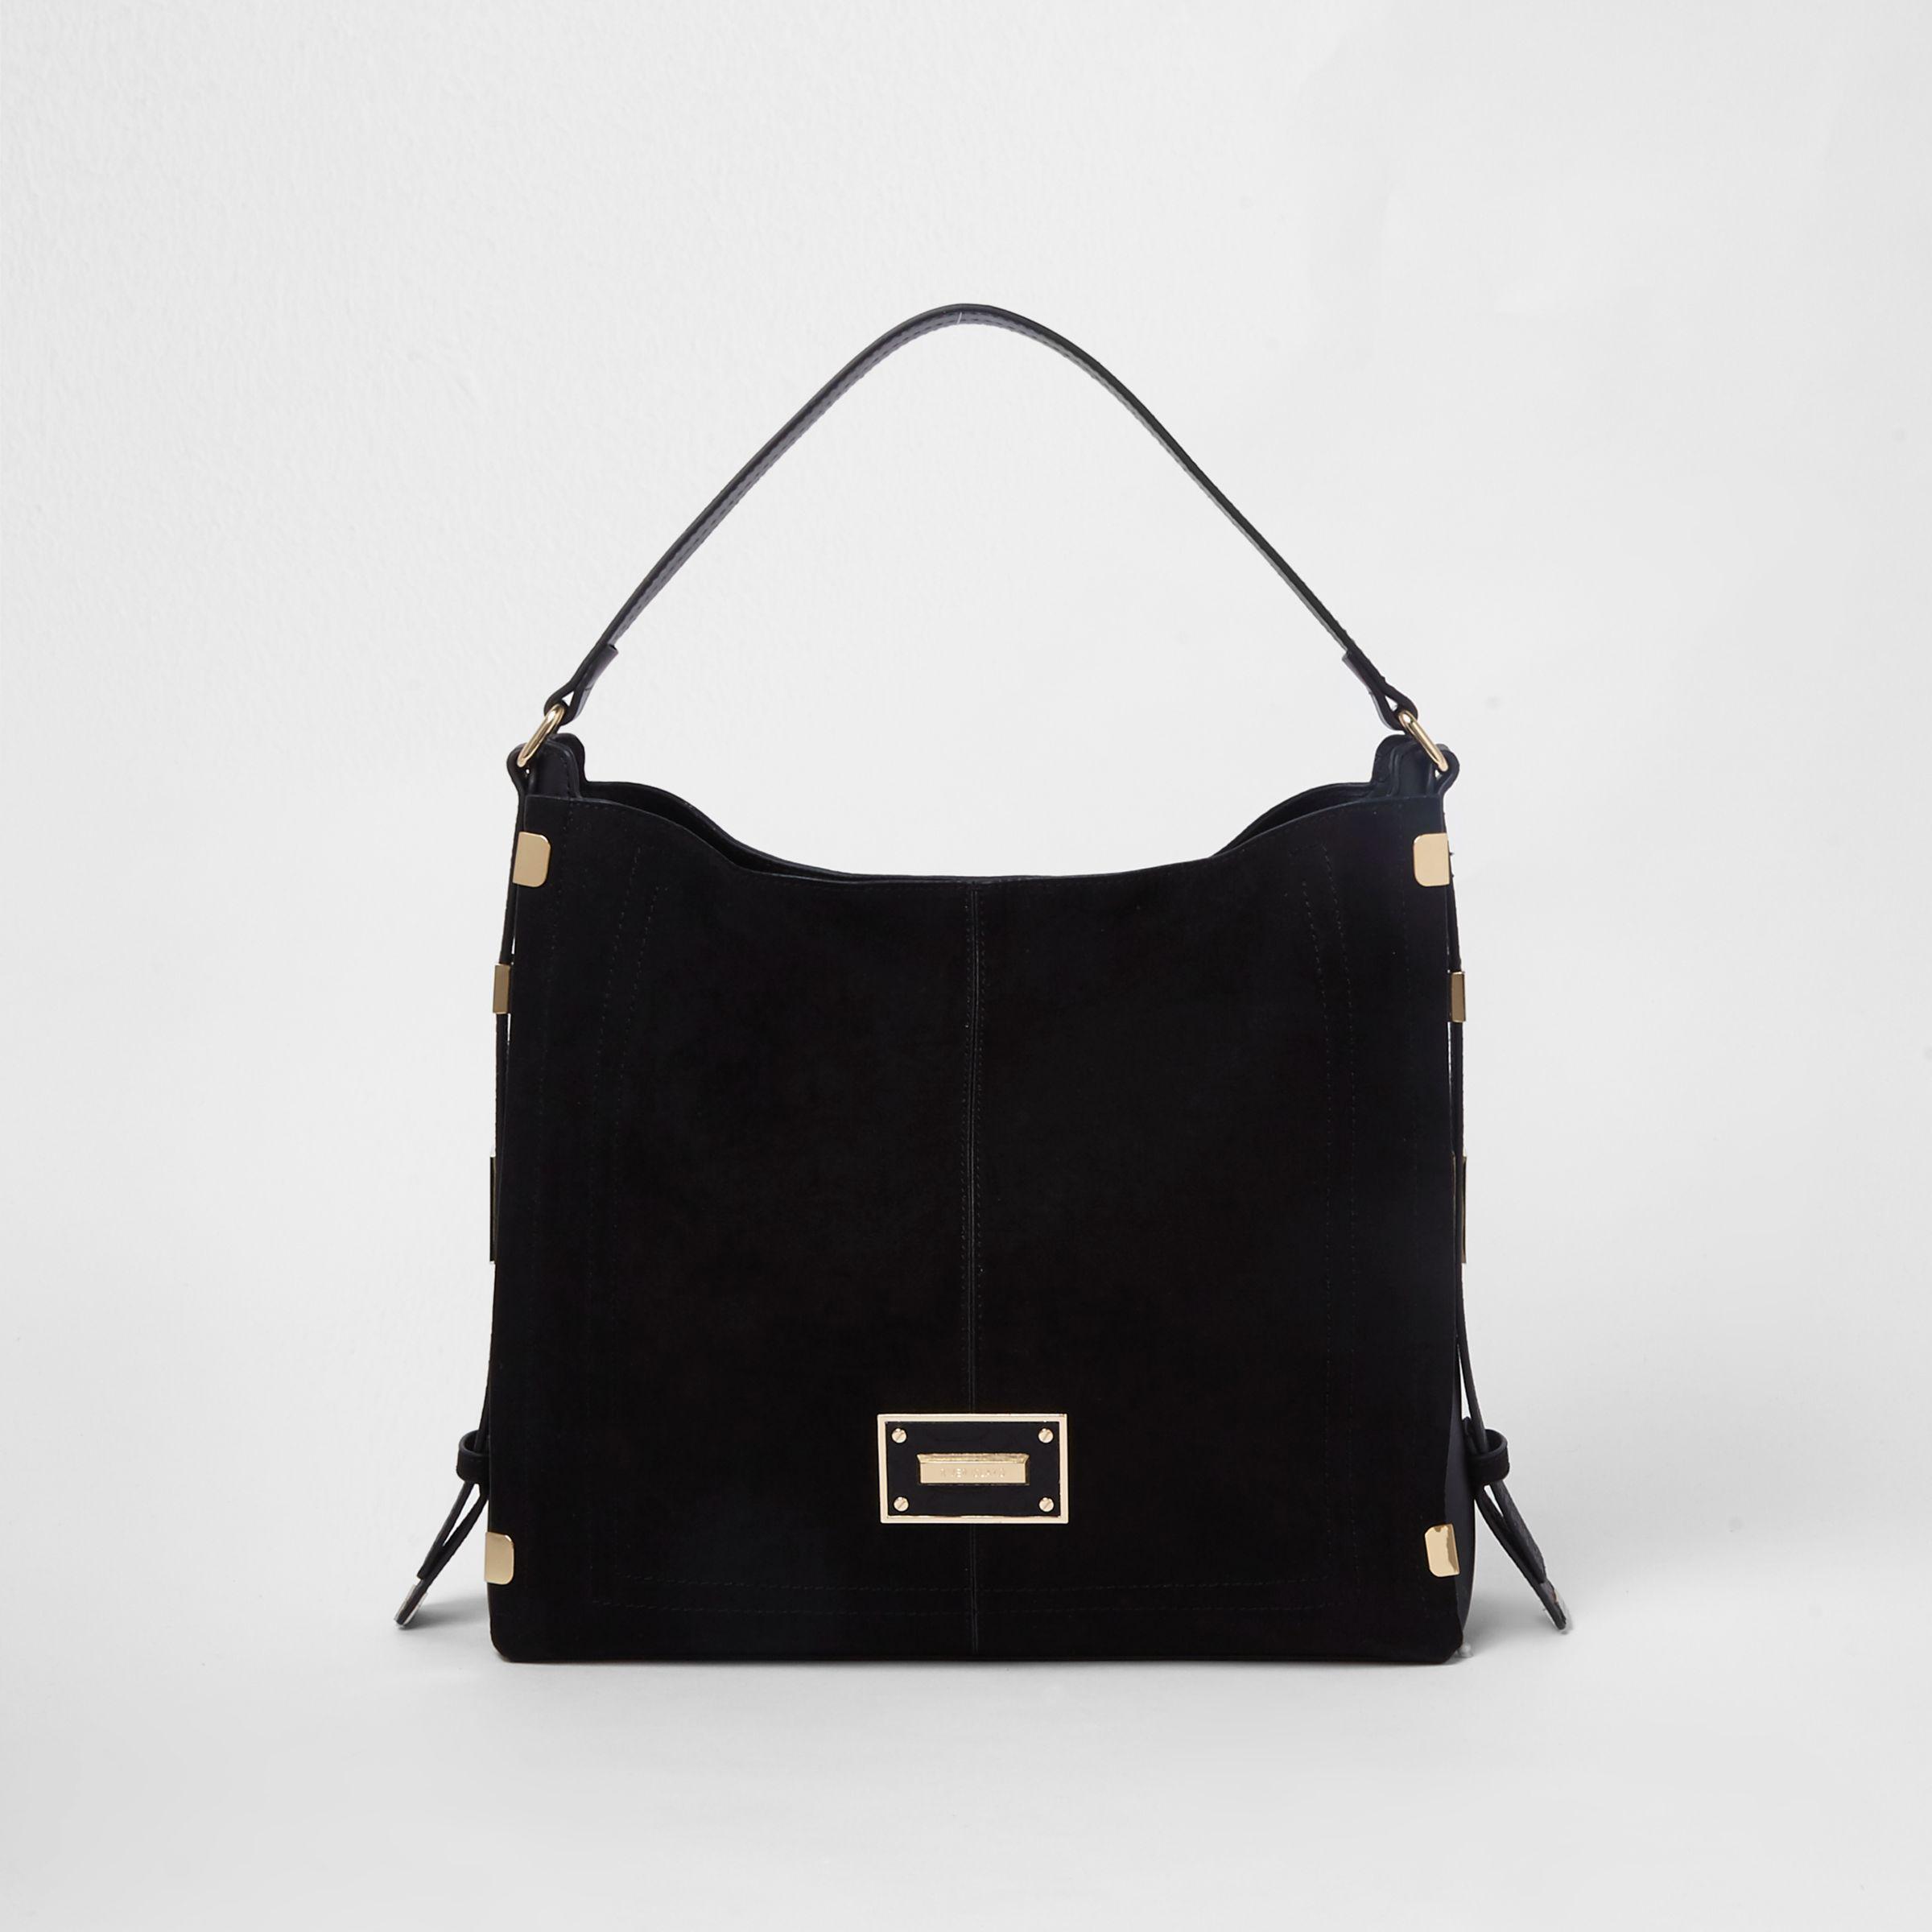 6652af6f03 Lyst - River Island Black Side Tab Slouch Bag in Black